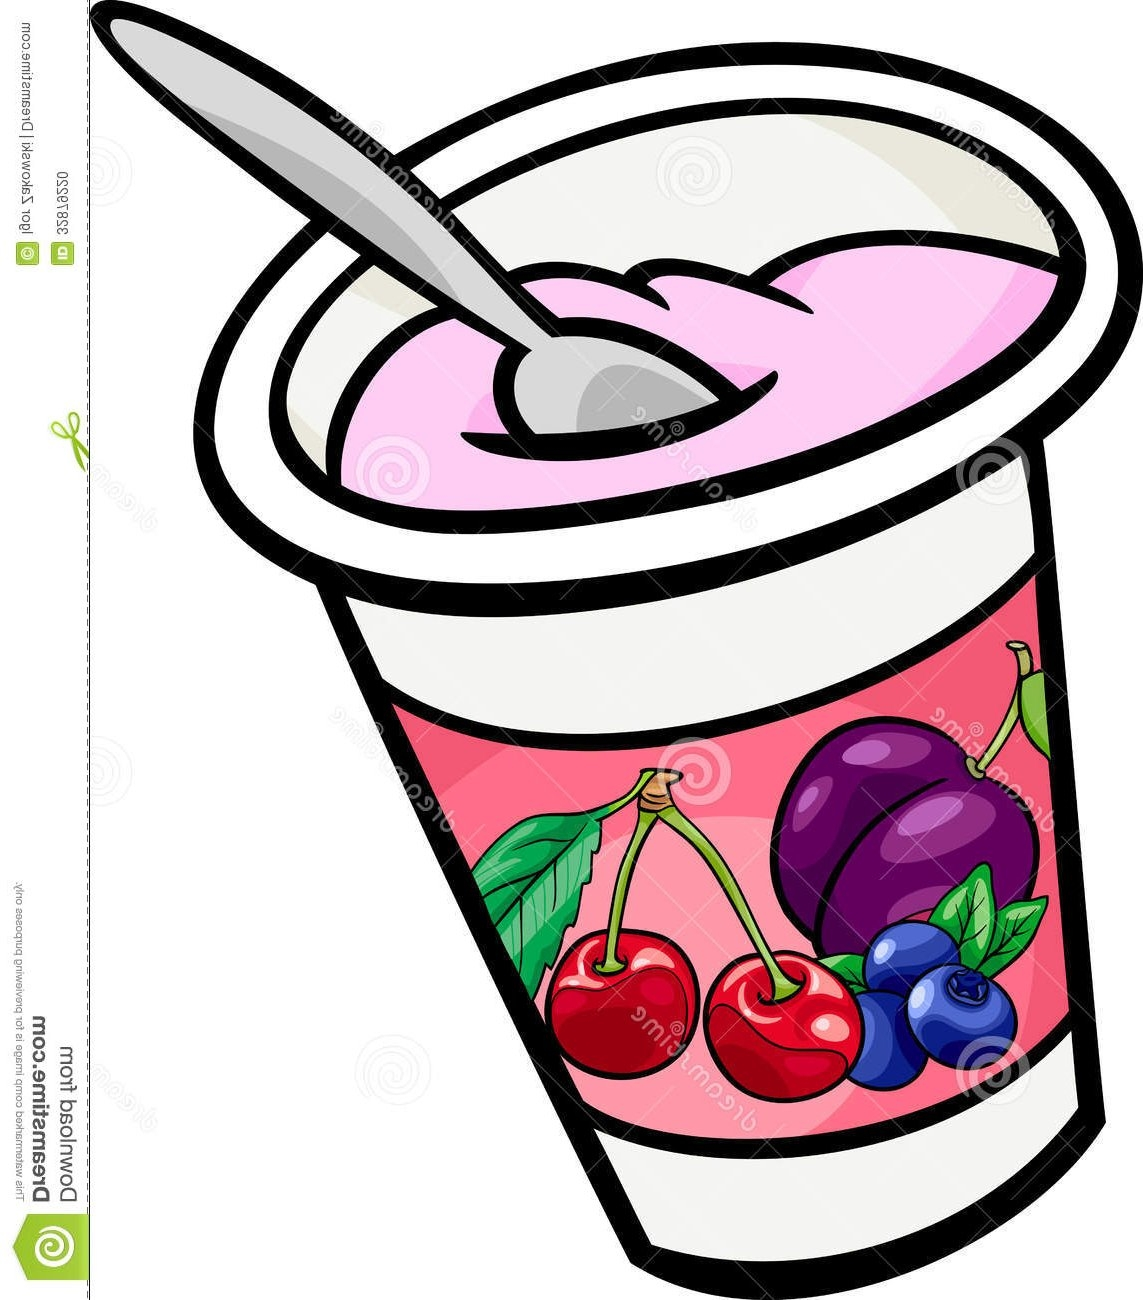 Yogurt clipart, Yogurt Transparent FREE for download on.